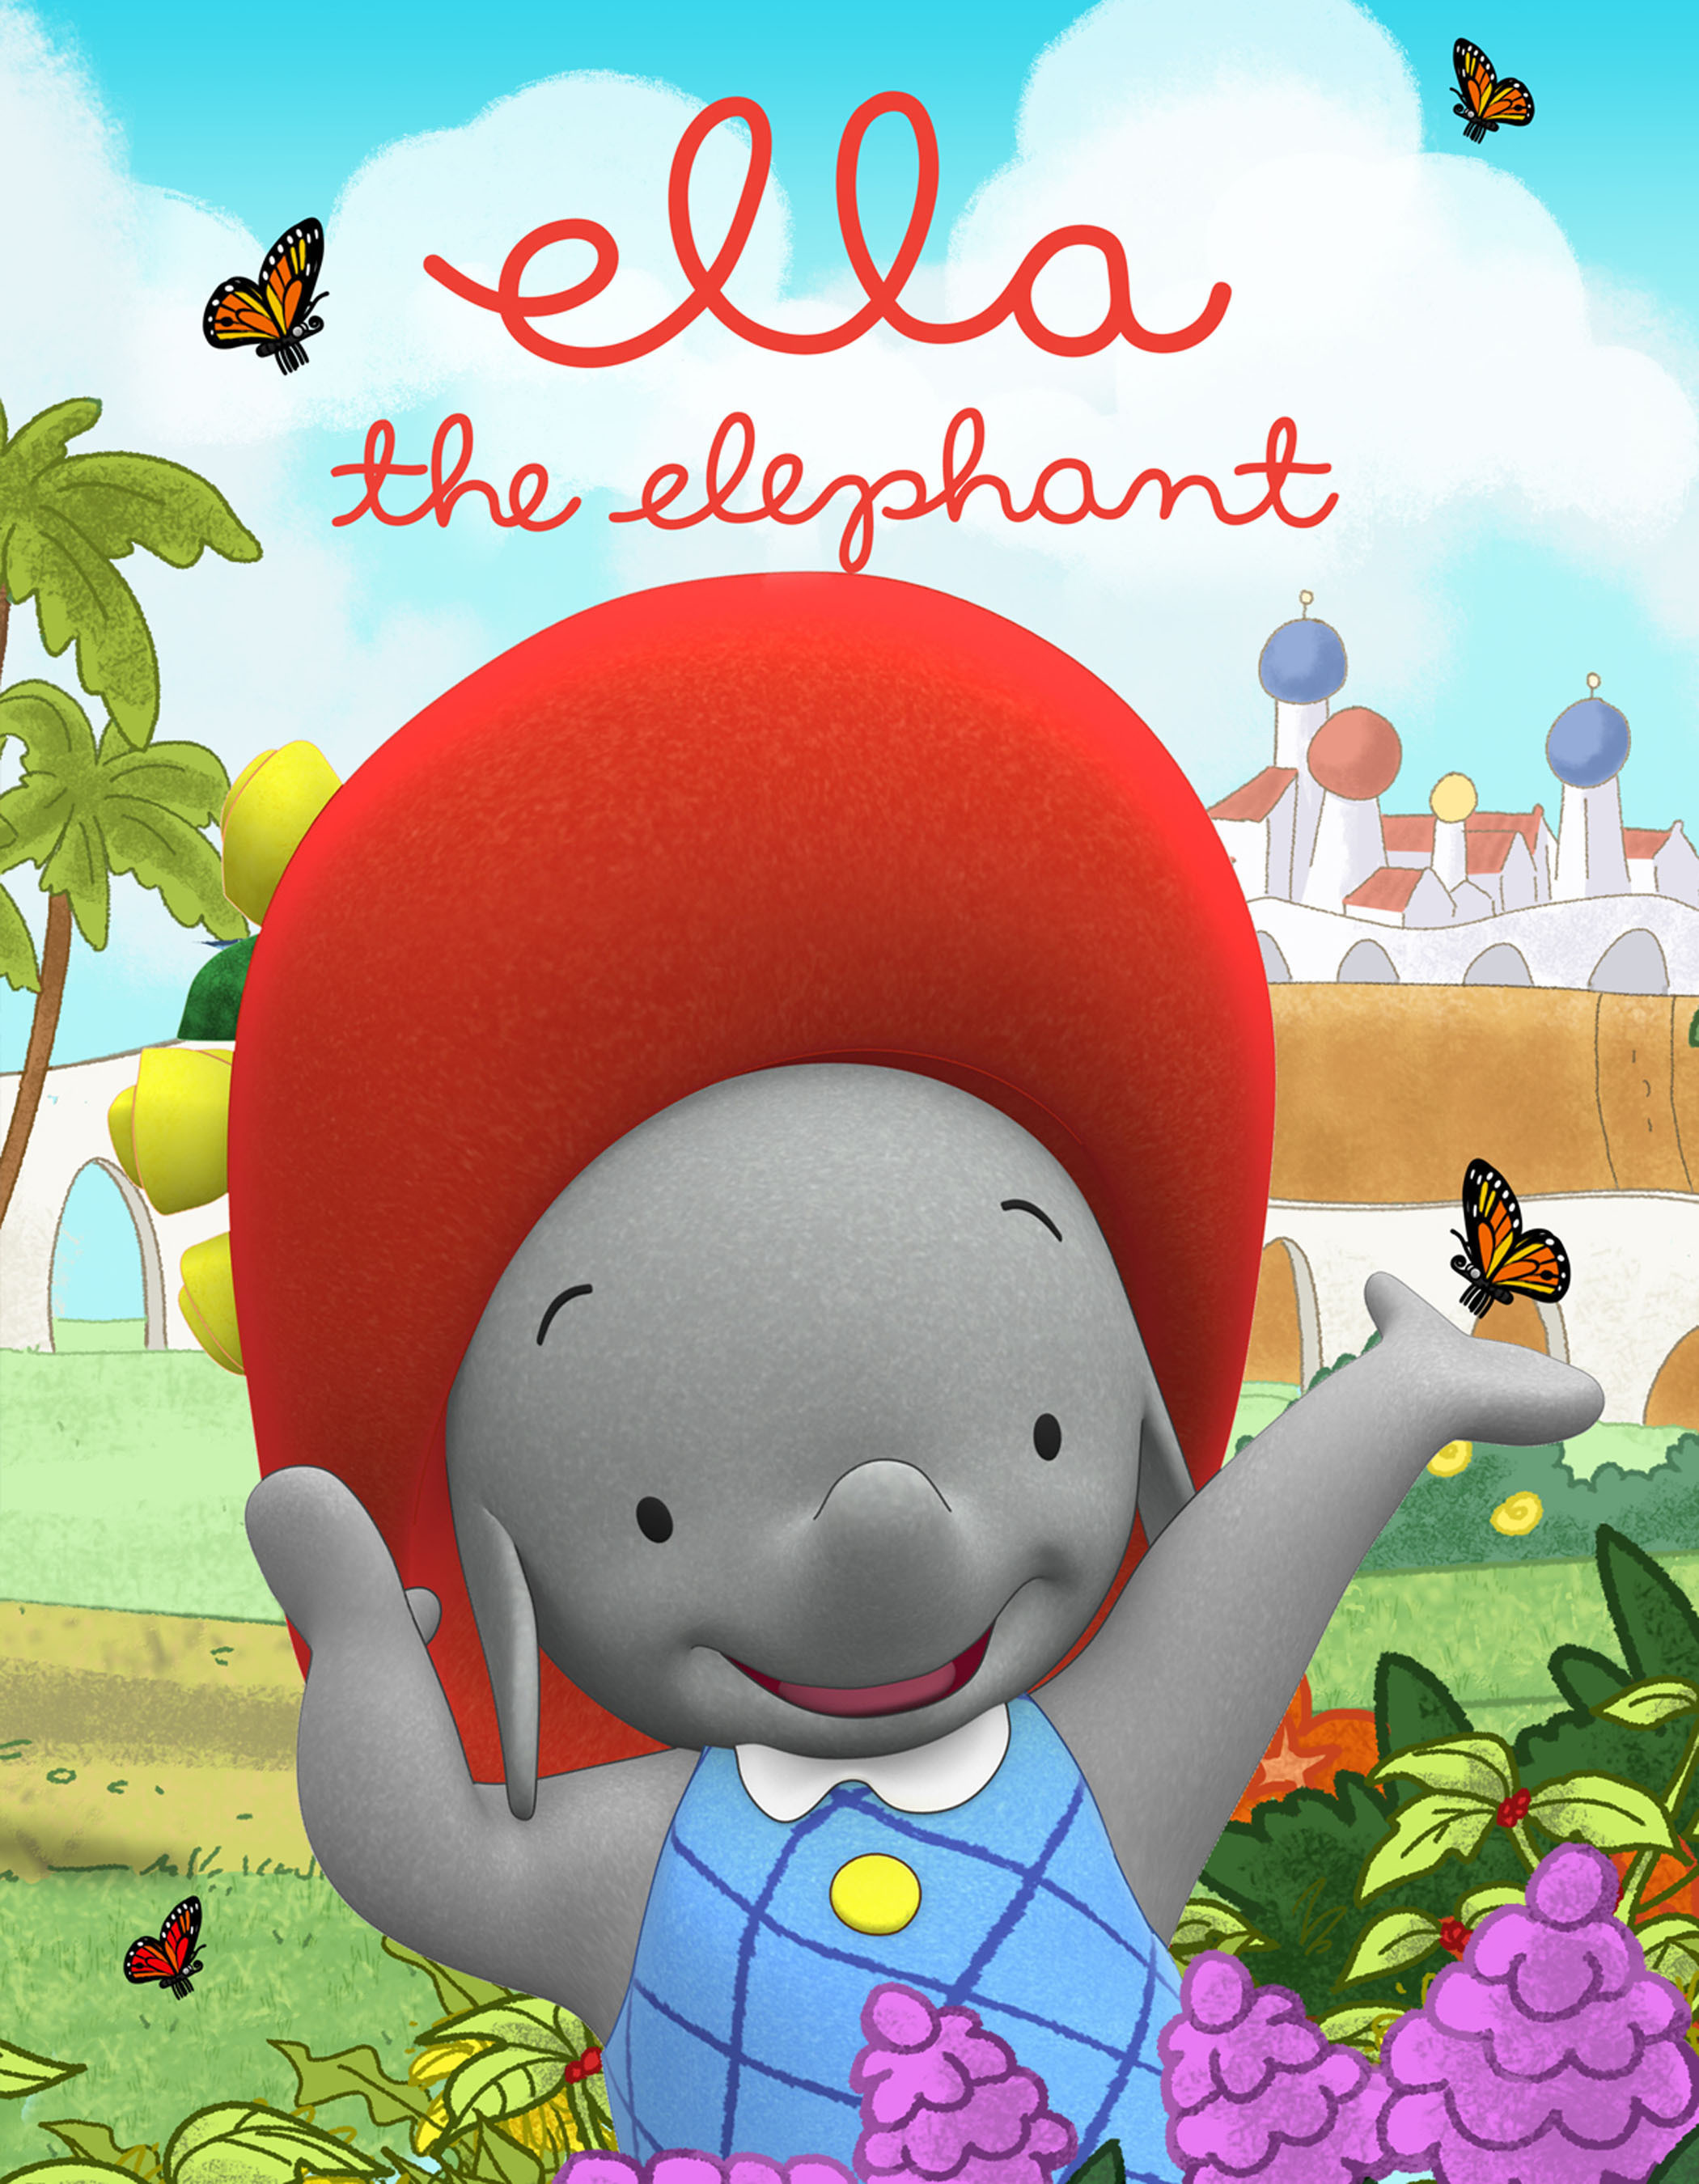 Disney Channel to Debut New Animated Preschool Series ELLA THE ELEPHANT, 2/17